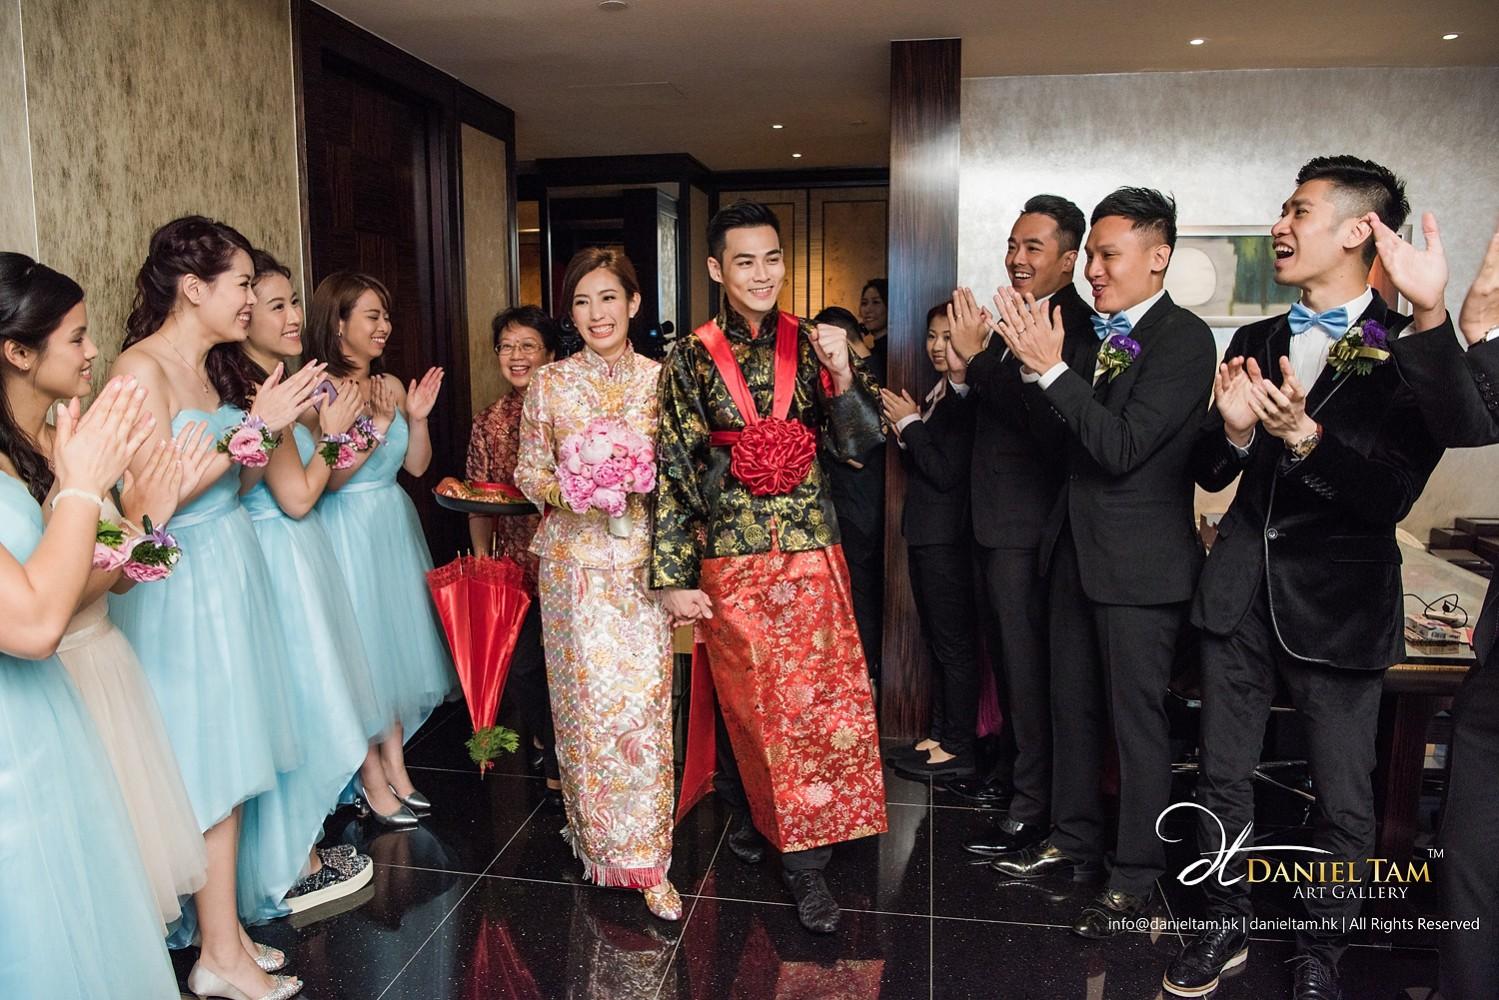 wedding-day-photography-hk-four-seasons-jessica-erik-01wedding-day-photography-hk-four-seasons-jessica-erik-13